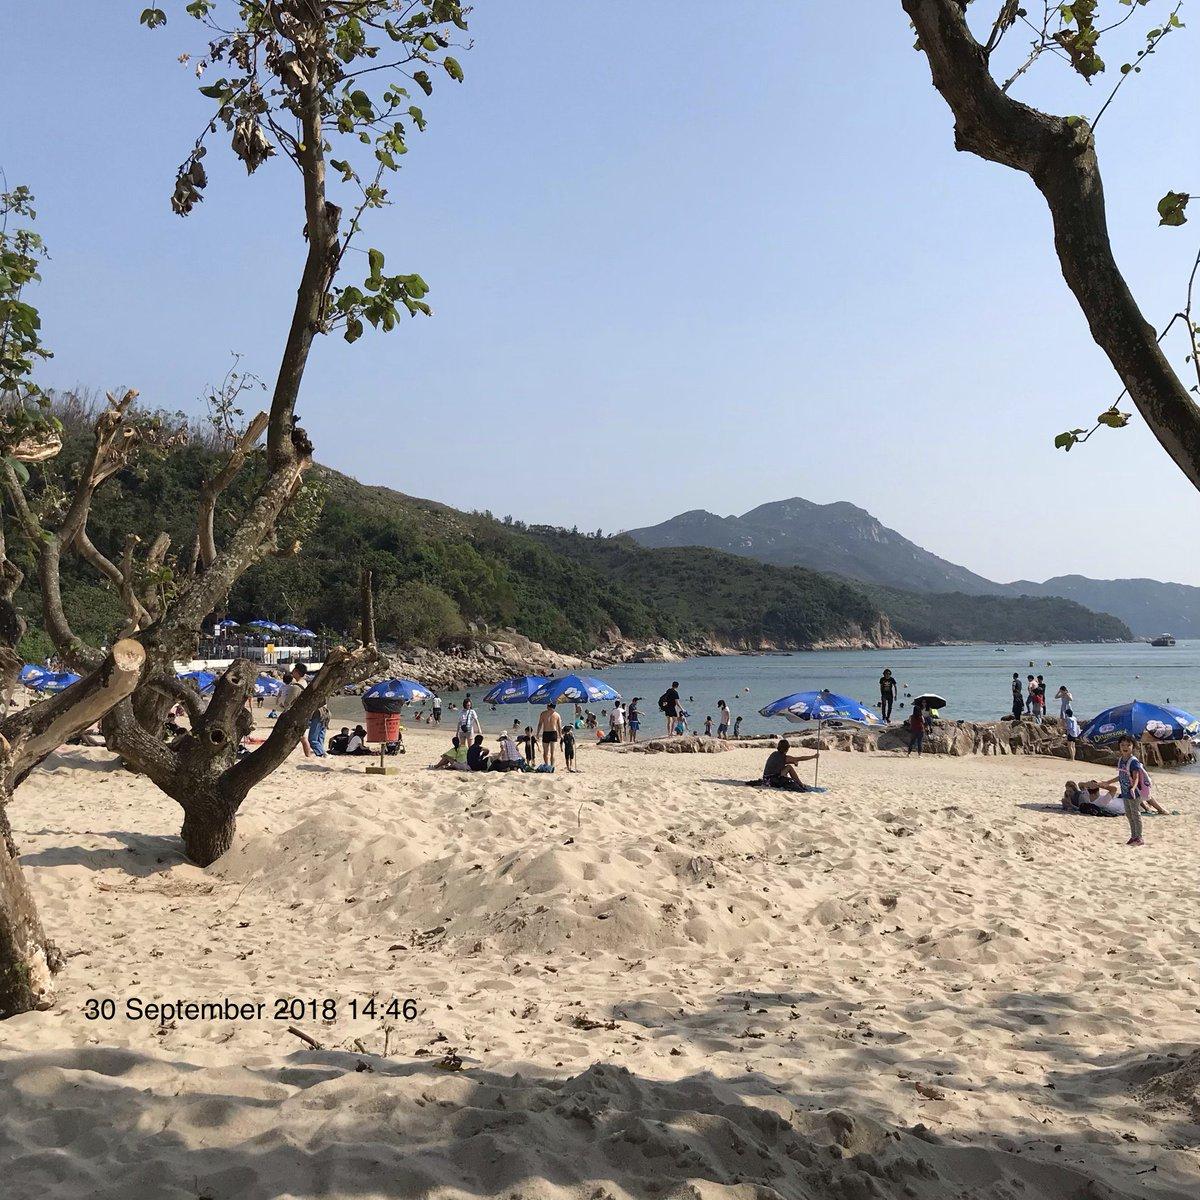 Sandy beach, warm day, & mountain view on Hung Shing Ye bay on Lamma island